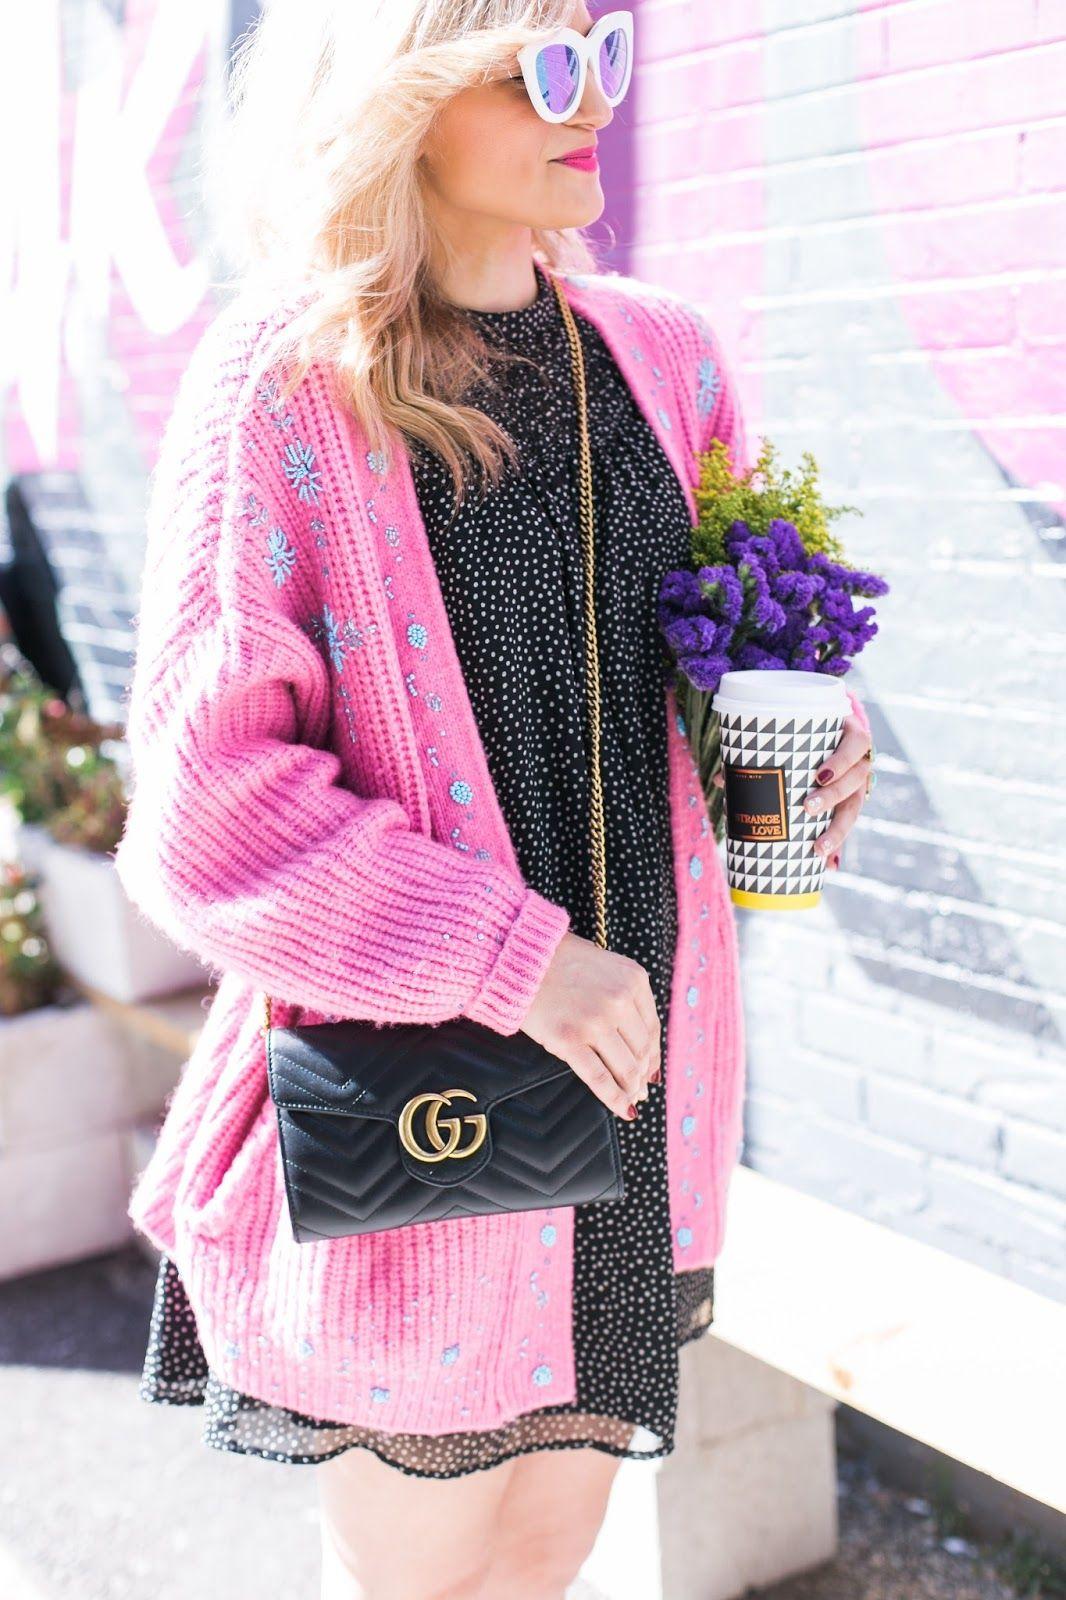 f0ac82f74b06 GG Marmont Matelassé Mini Bag Review | Fashion Bags | Gg marmont ...